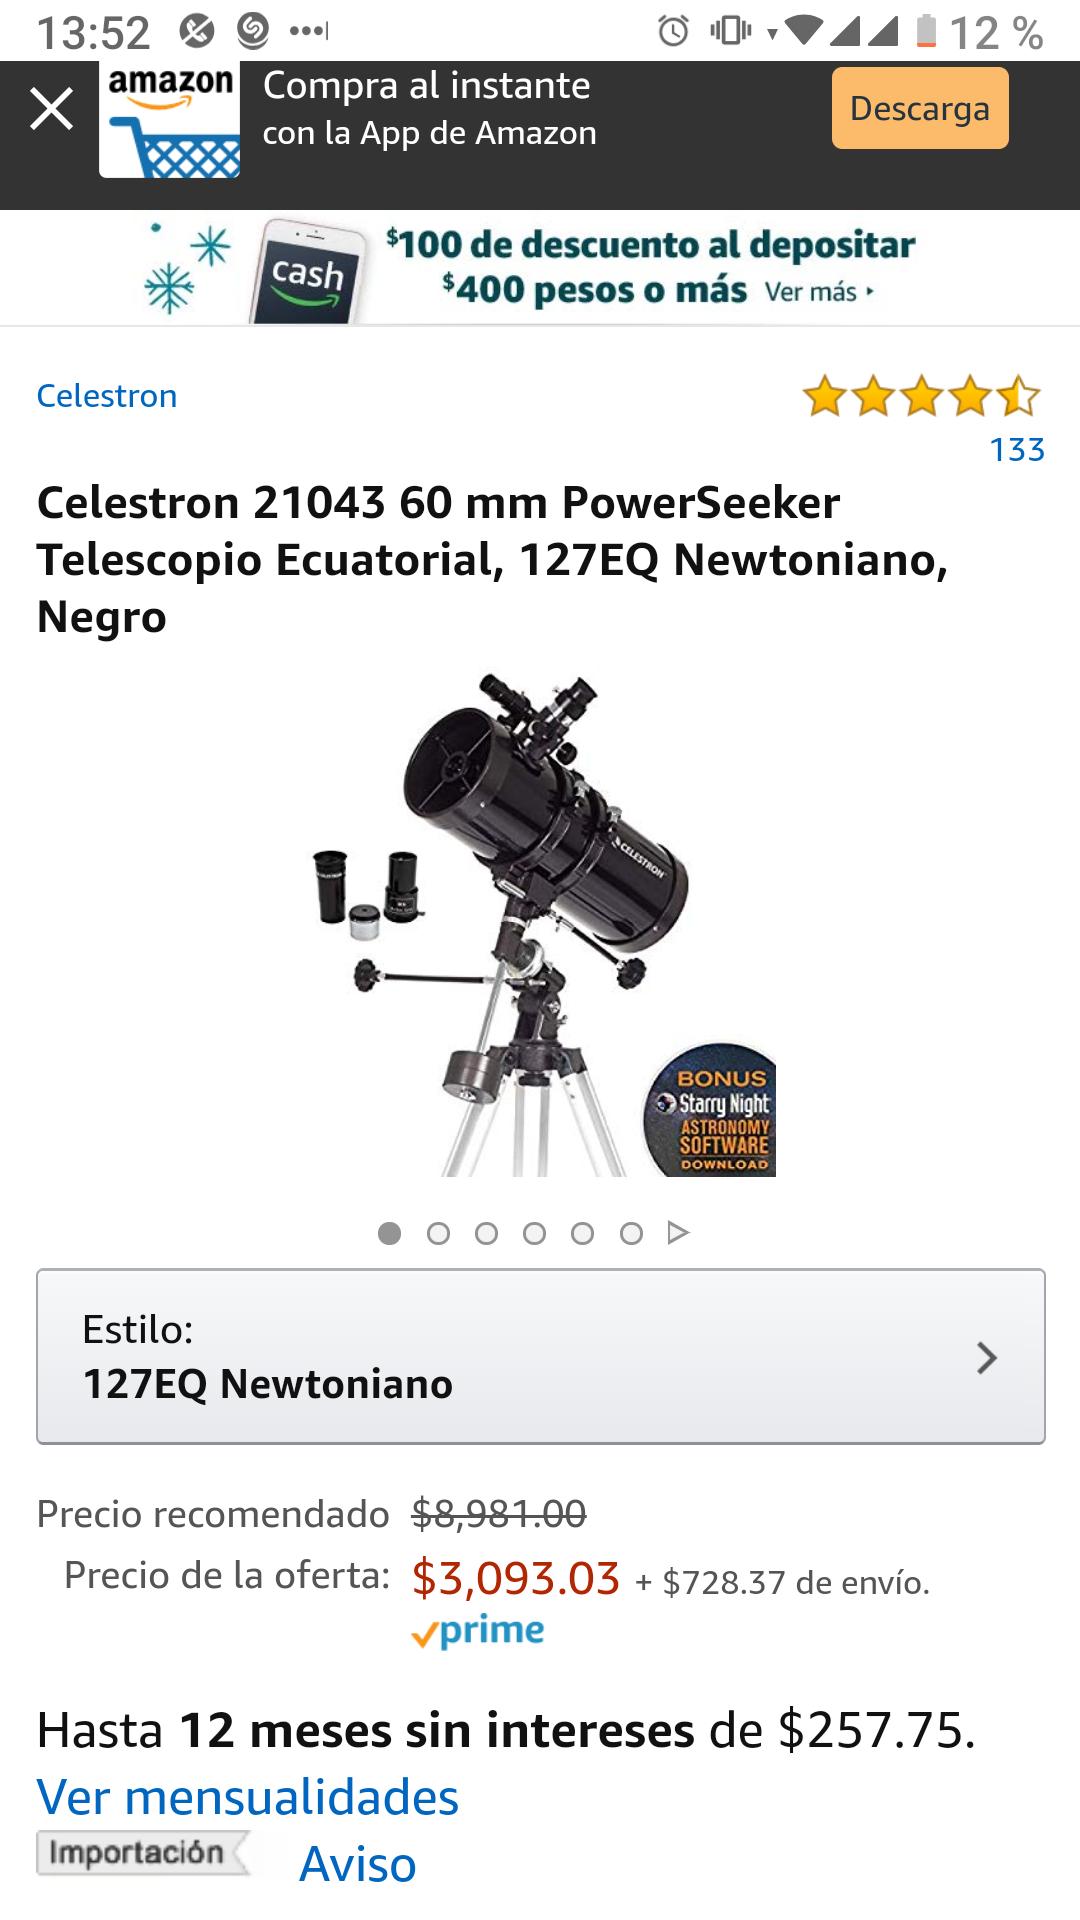 Amazon: Celestron 2104360mm PowerSeeker Telescopio Ecuatorial, 127EQ Newtoniano, Negro